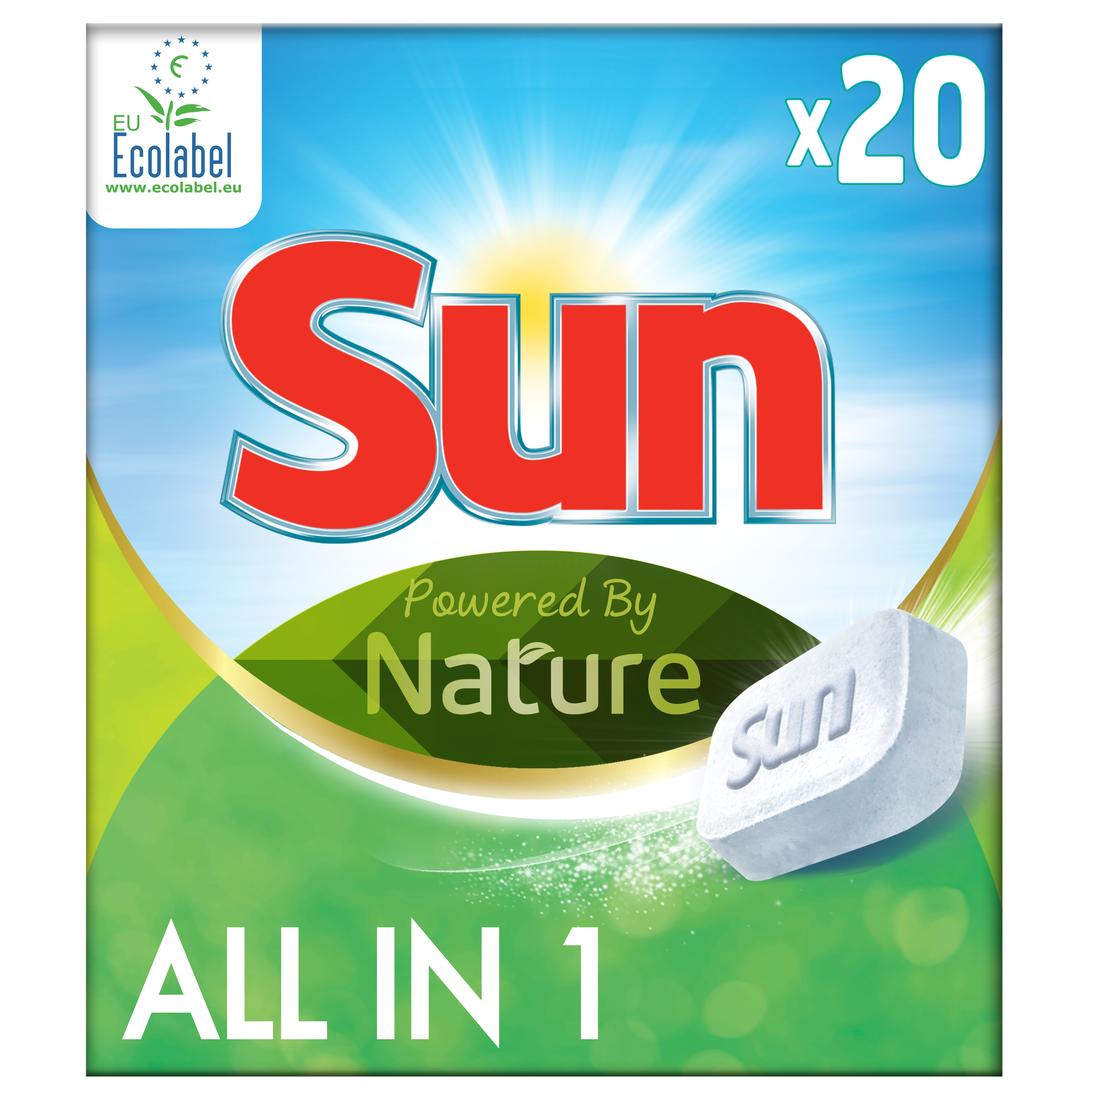 10 Pallets of Sun Dishwashing Detergent, 14,000 Pieces/1,000 Cases, Ext. Retail €111,860, Tiel, NL